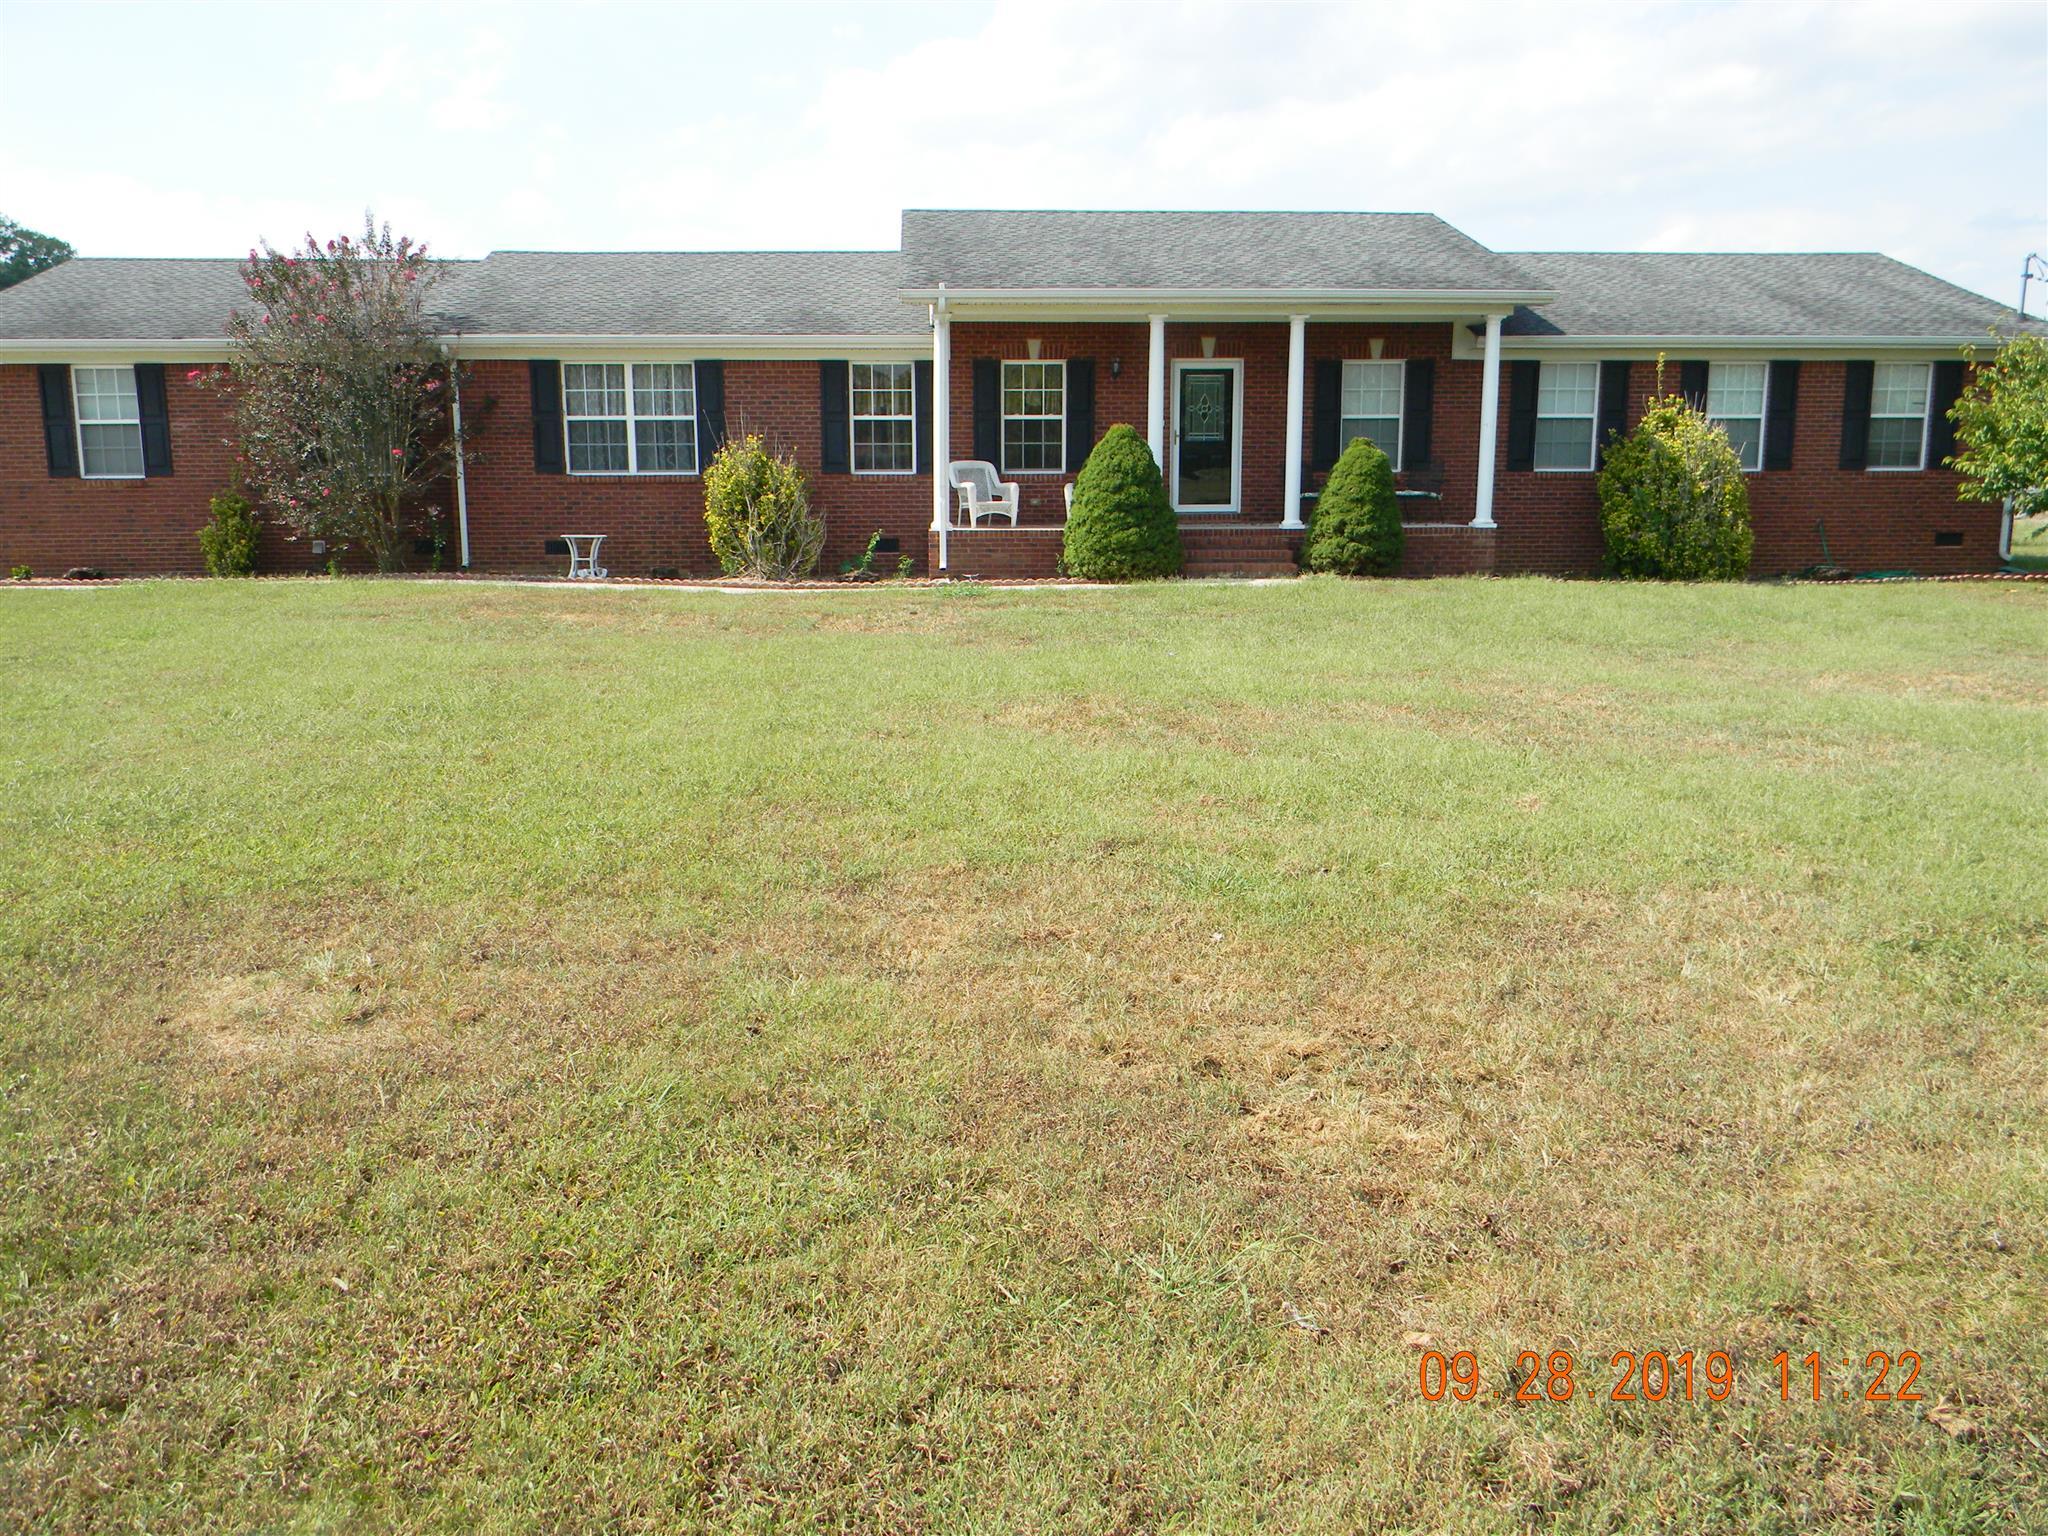 195 Maxwell Chapel Rd, Unionville, TN 37180 - Unionville, TN real estate listing